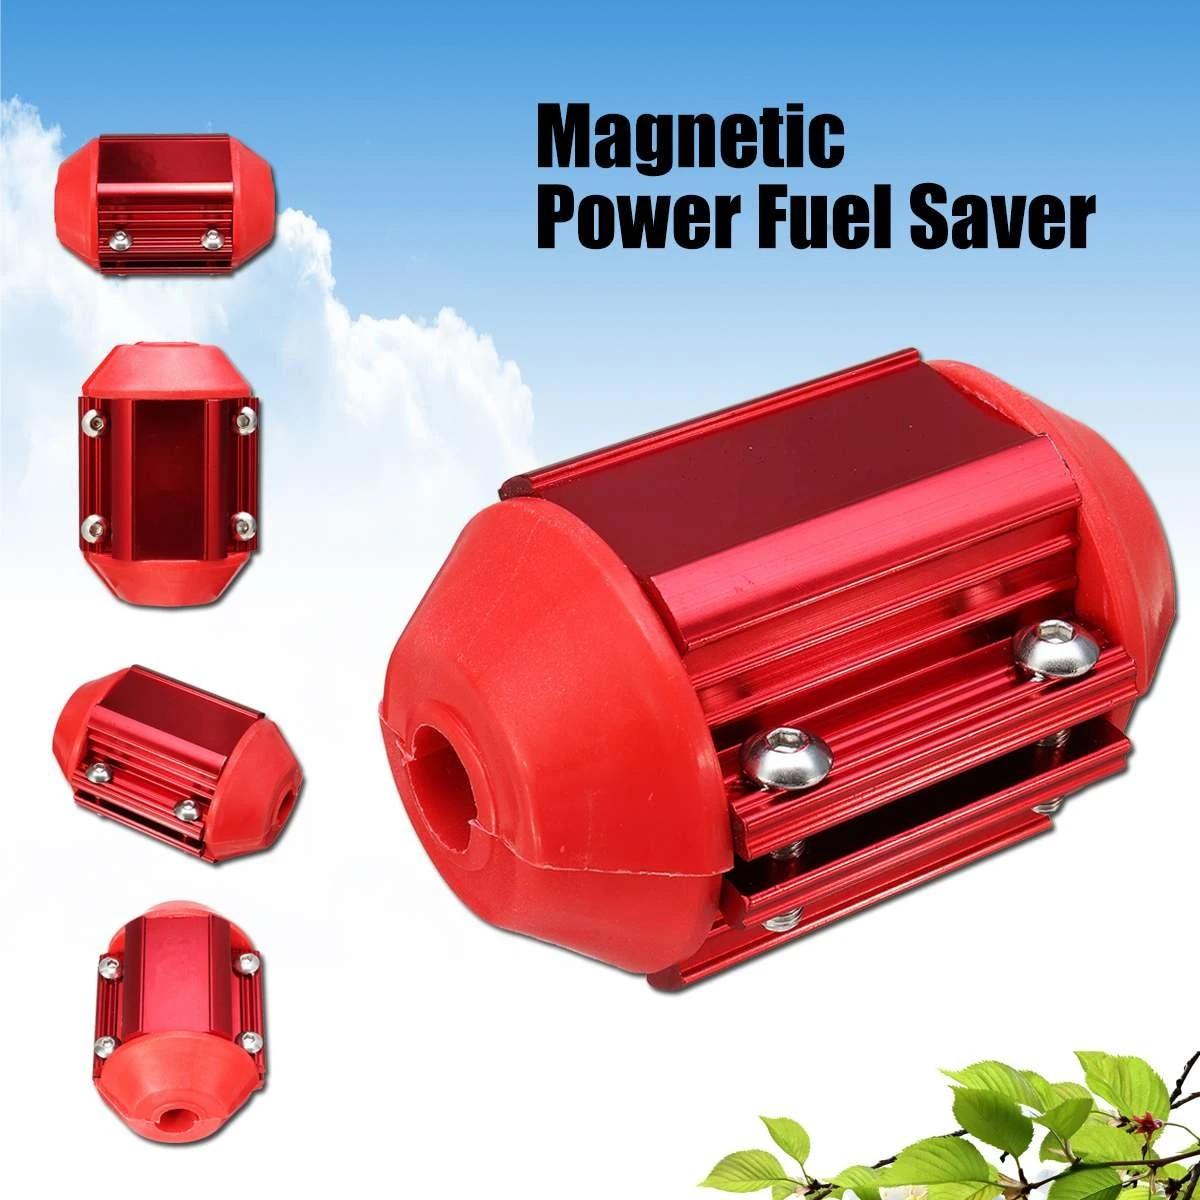 Aramox Fuel Saver,Universal Magnetic Fuel Gasoline Saver Vehicle Energy Saver Car Assisting Tool 2 PCS